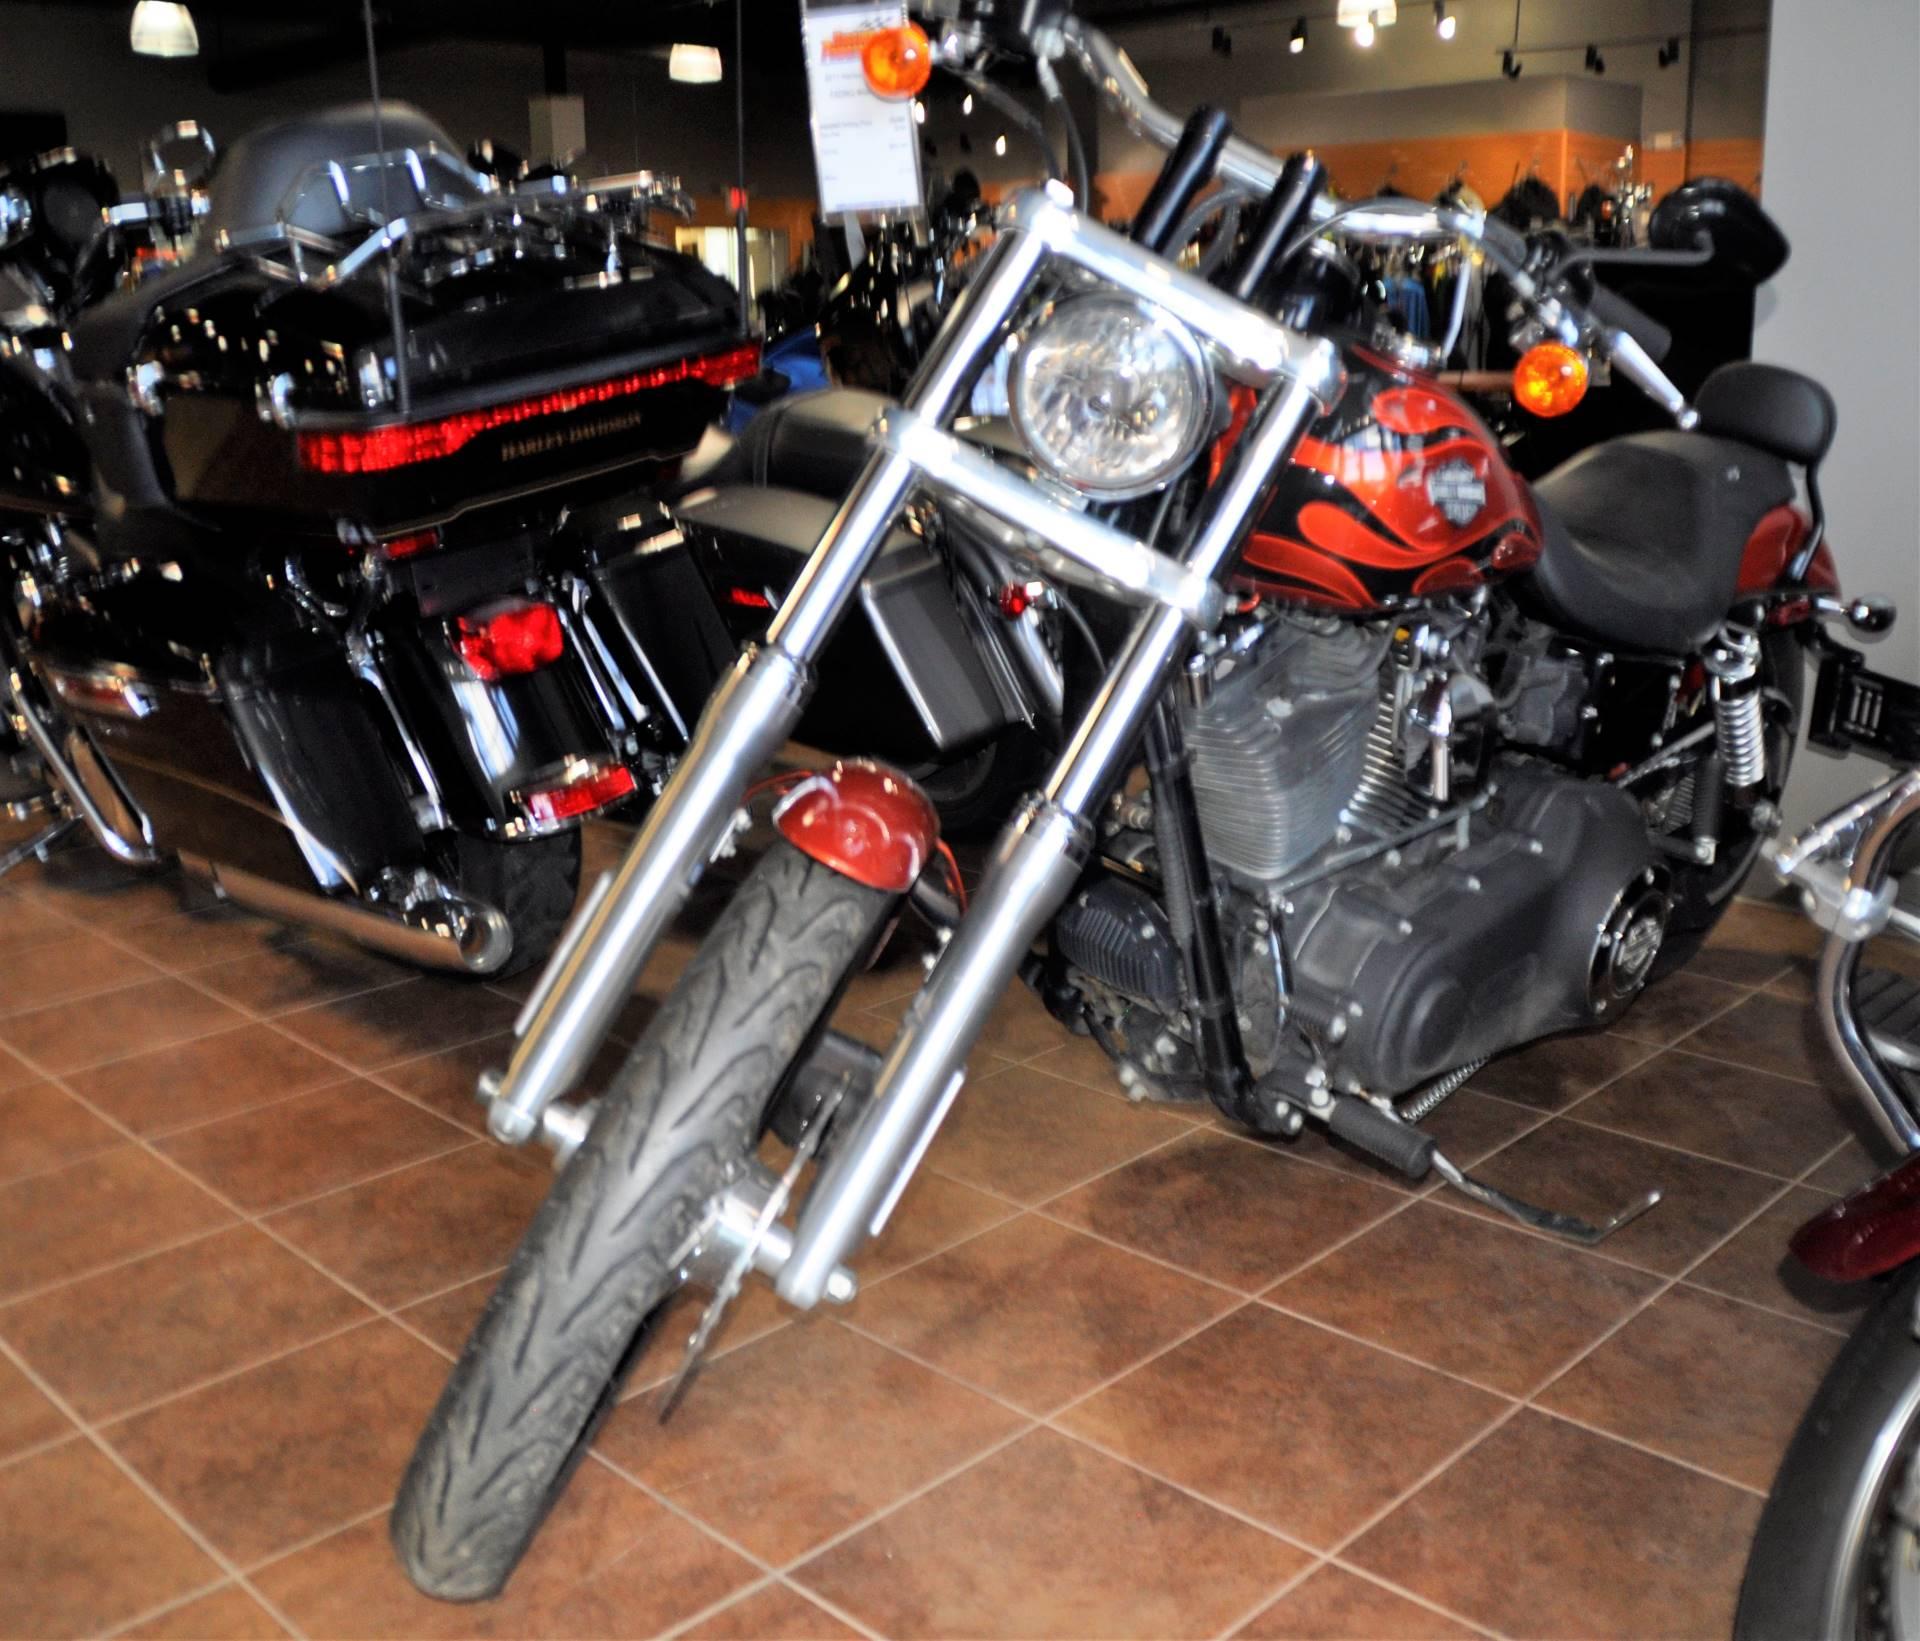 2011 Harley-Davidson Dyna Wide Glide 3